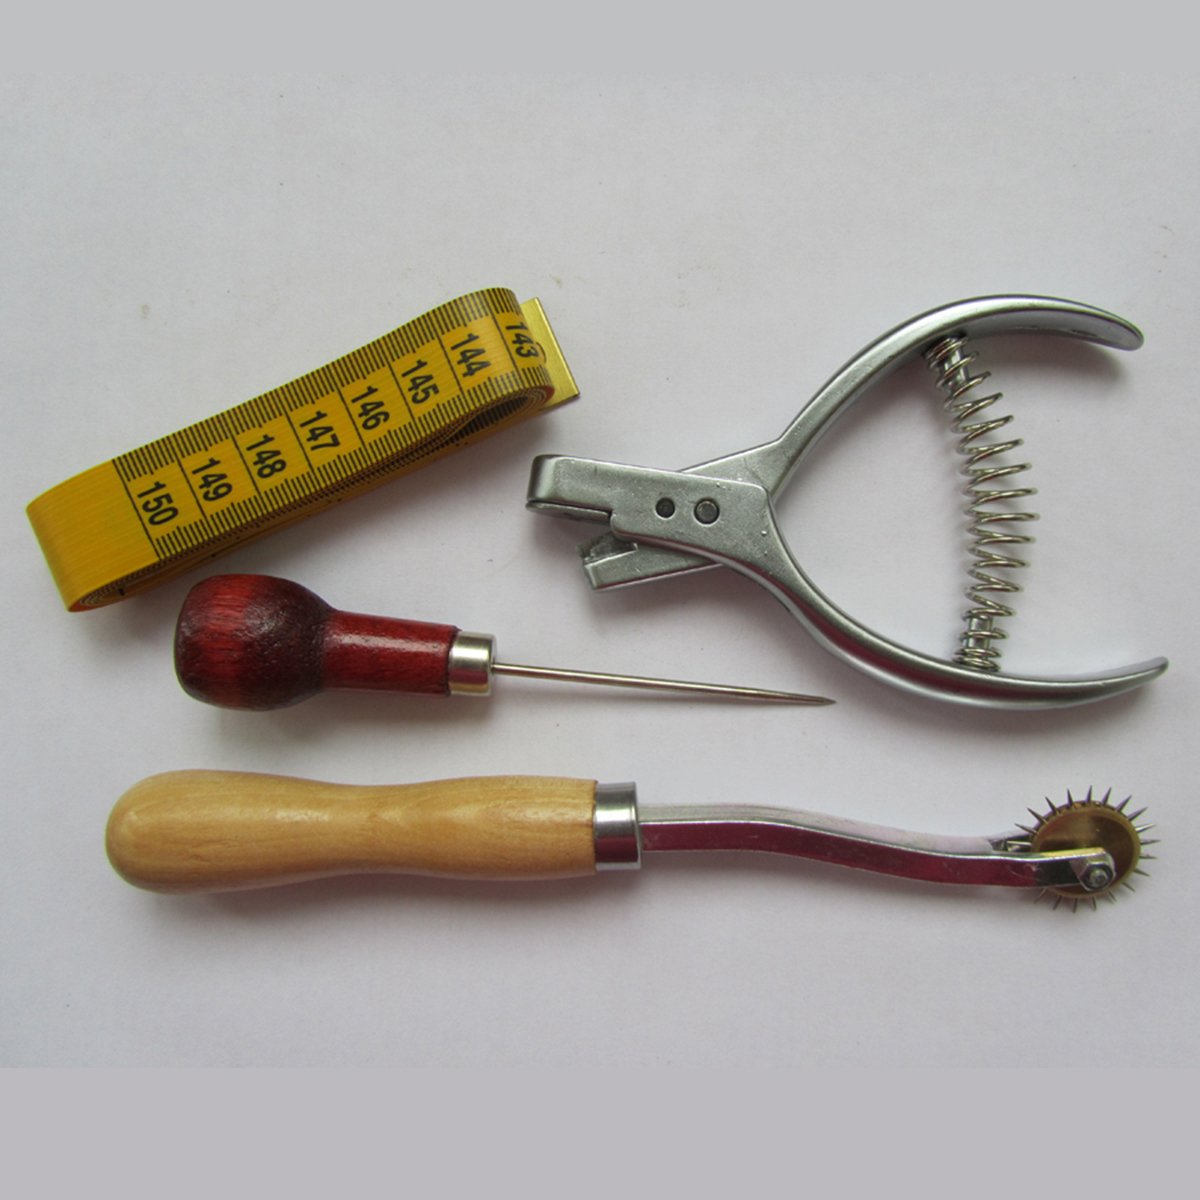 KUNPENG - PATTERN DESIGNER SET - NOTCHER+AWL+TRACING WHEEL+TAPE